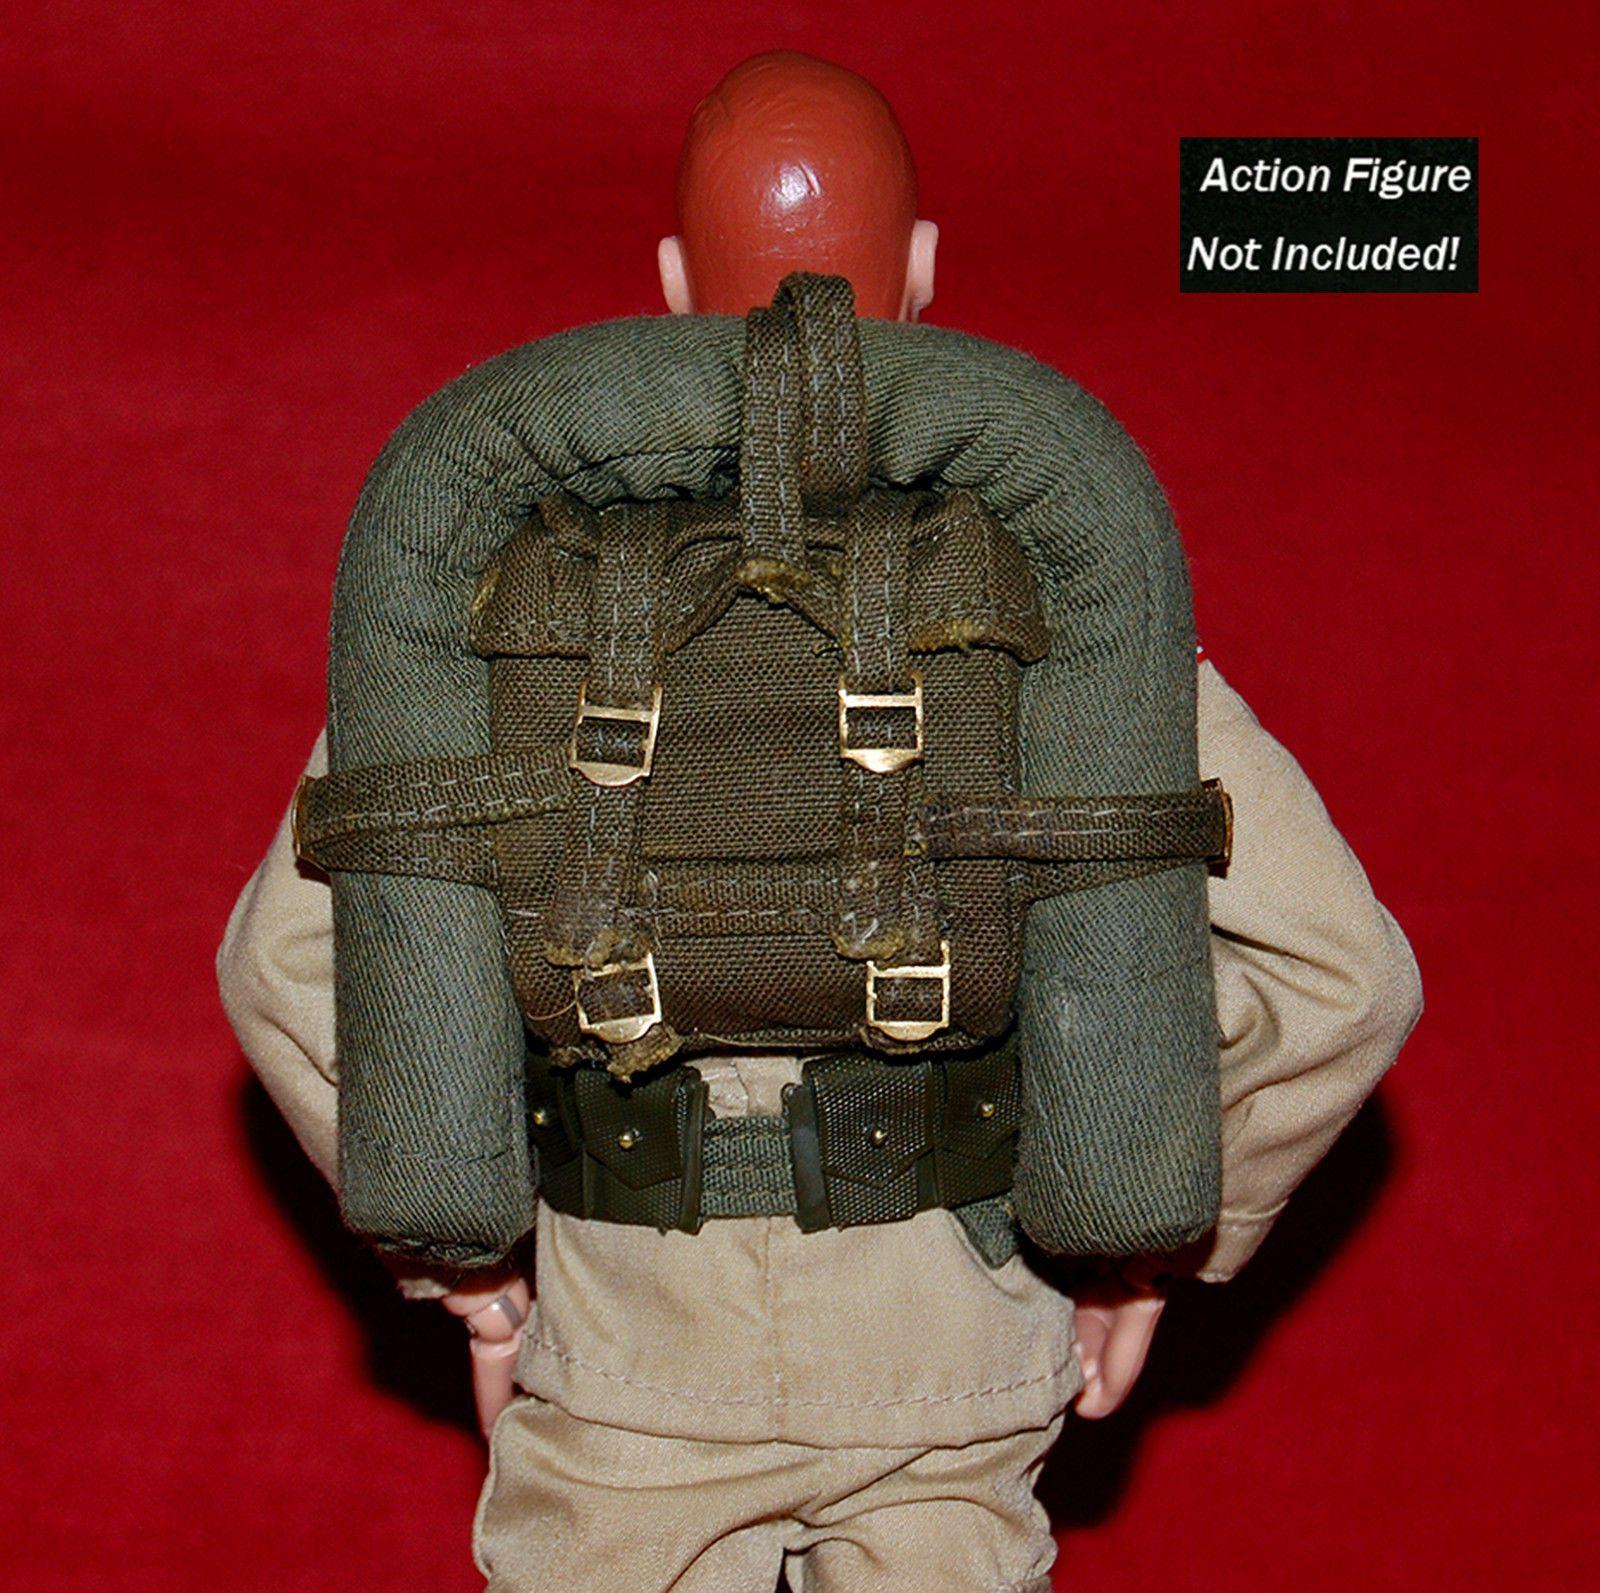 VINTAGE 1964 GI JOE ACTION SOLDIER EARLY ISSUE COMBAT FIELD PACK u0026 BIVOUAC TENT | eBay & VINTAGE 1964 GI JOE ACTION SOLDIER EARLY ISSUE COMBAT FIELD PACK ...